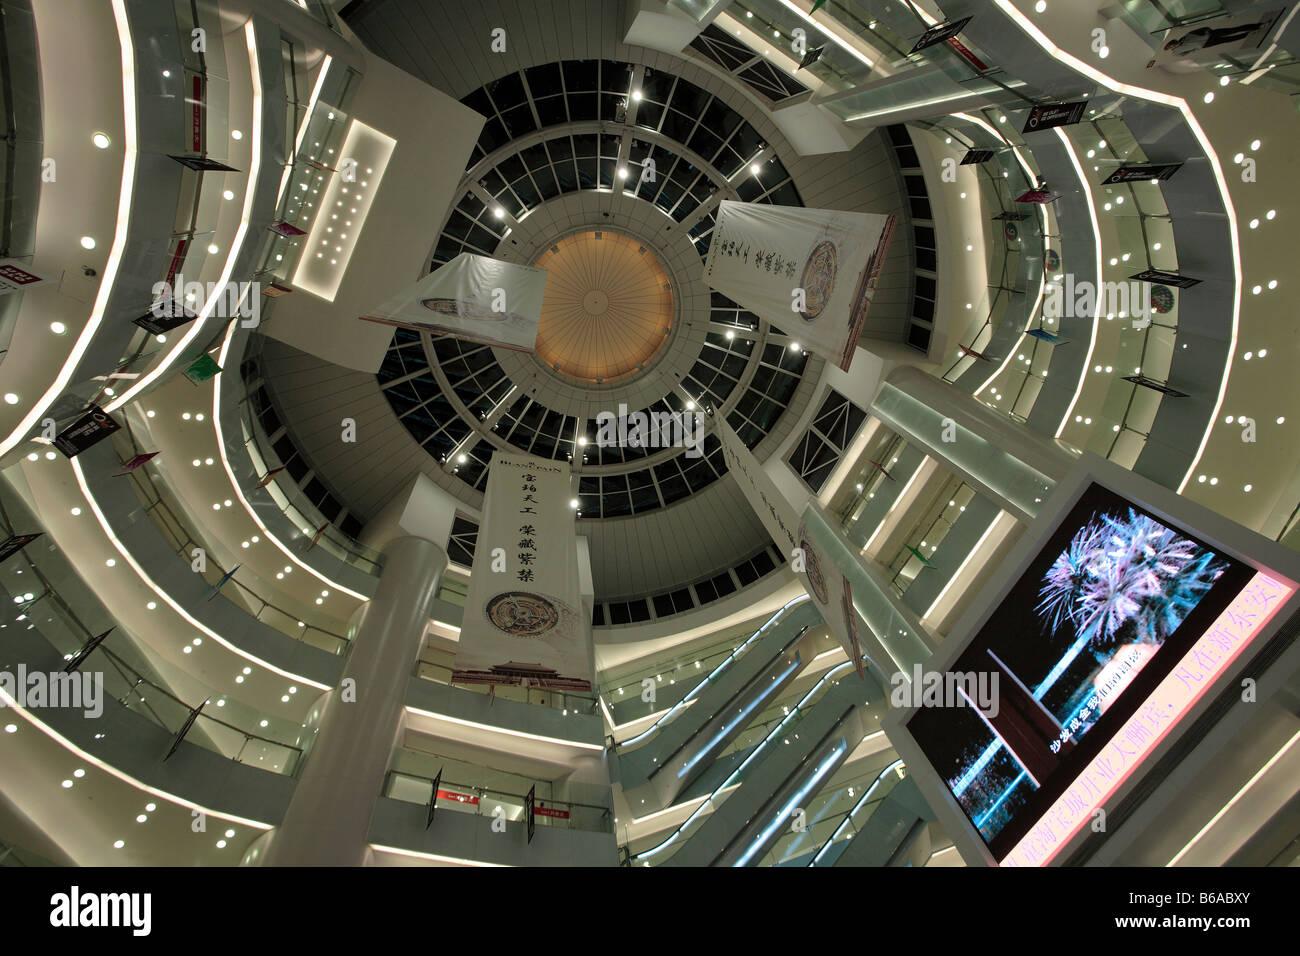 China Beijing Wangfujing shopping street mall interior - Stock Image